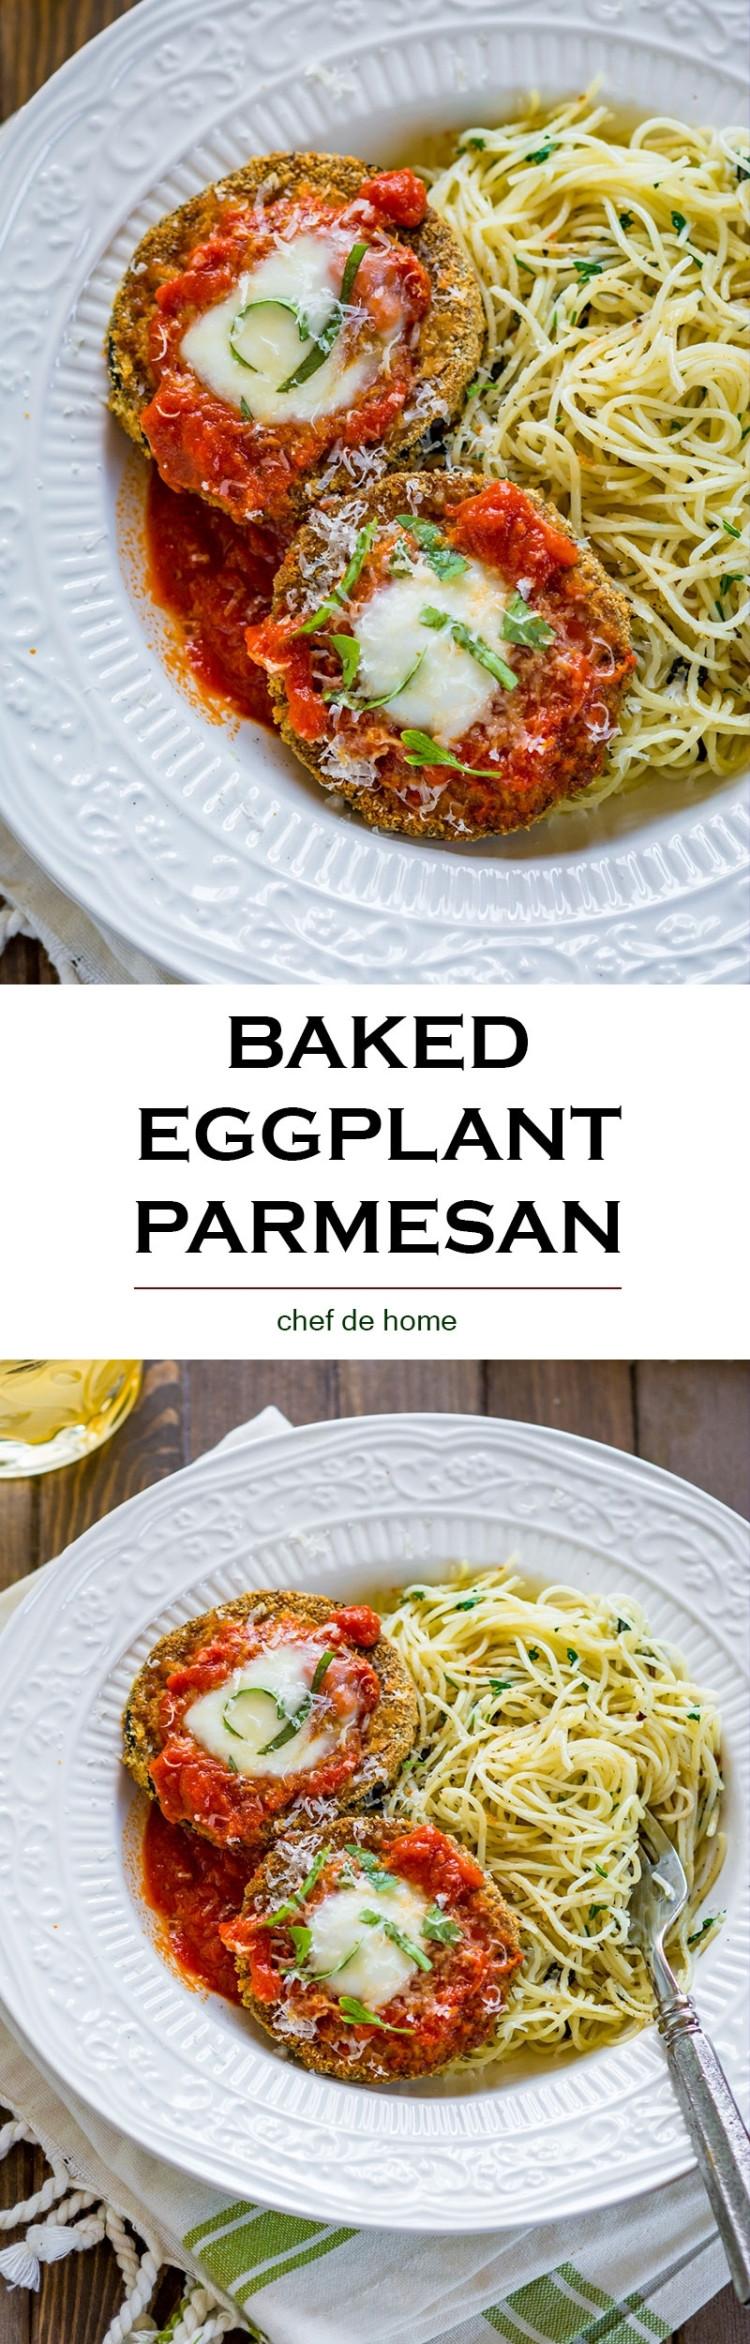 Healthy Eggplant Recipes  Healthy Baked Eggplant Parmesan Recipe